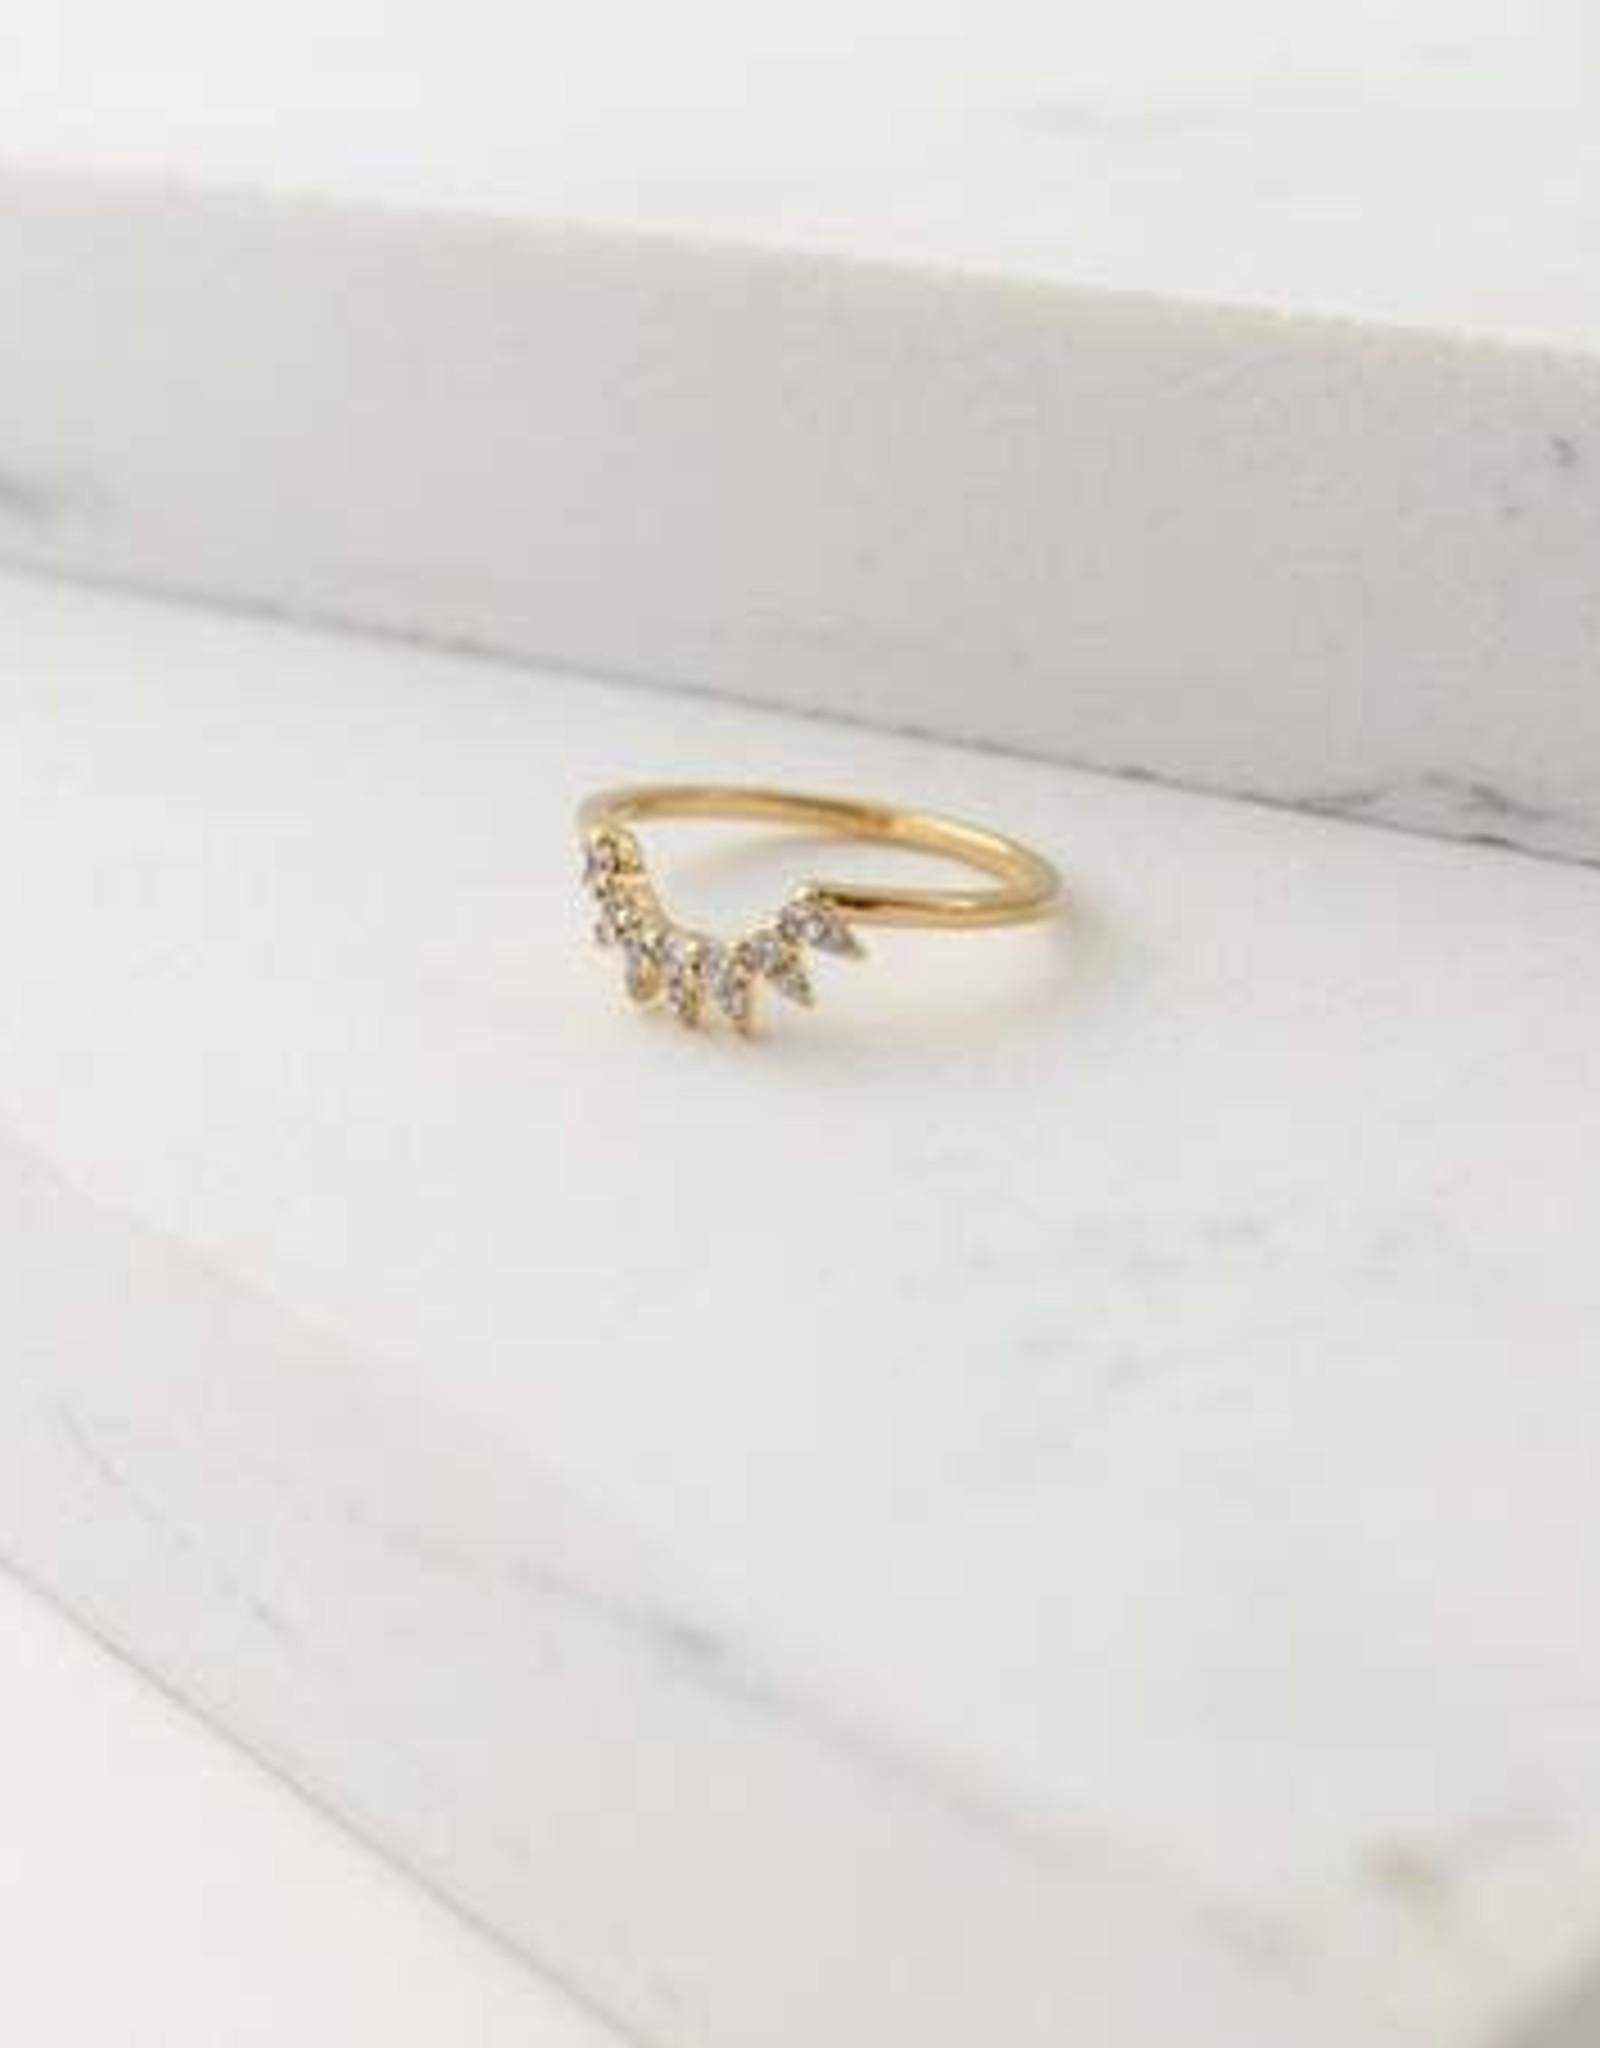 Nova Ring Size 7 - Gold